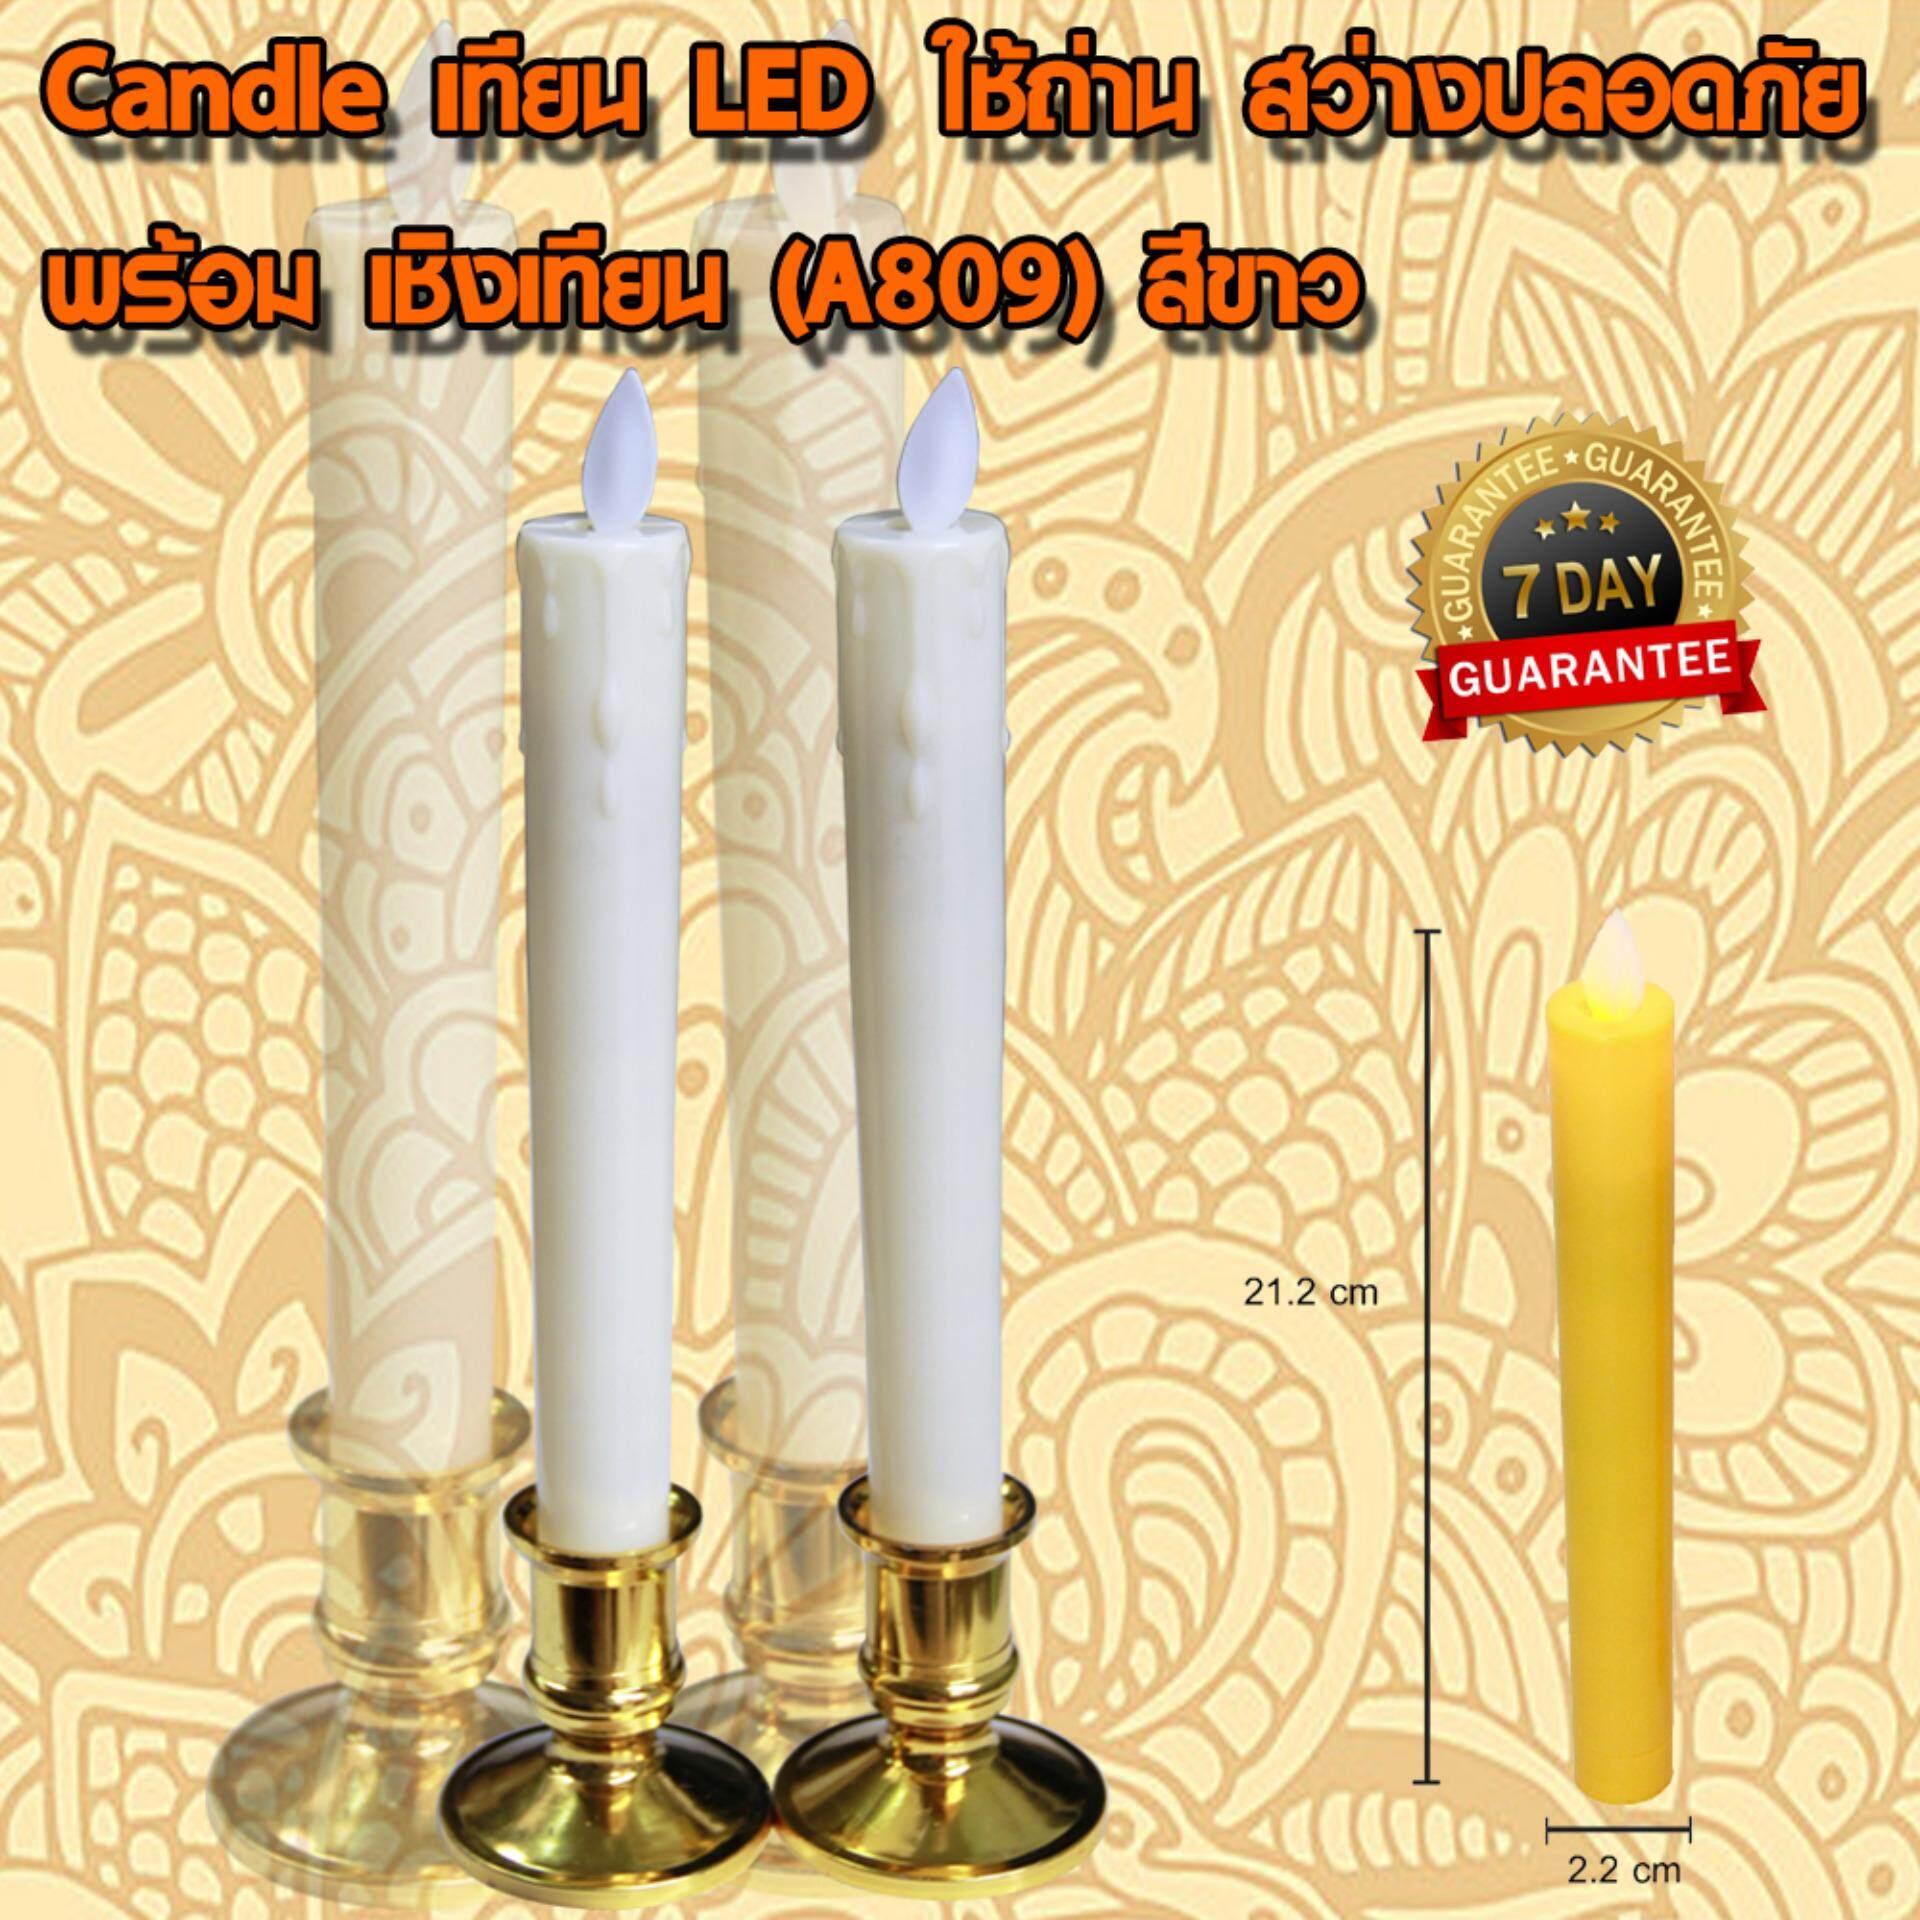 Imusic extra Candle เทียน LED ใช้ถ่าน สว่างปลอดภัย พร้อม เชิงเทียน (A809) สีขาว